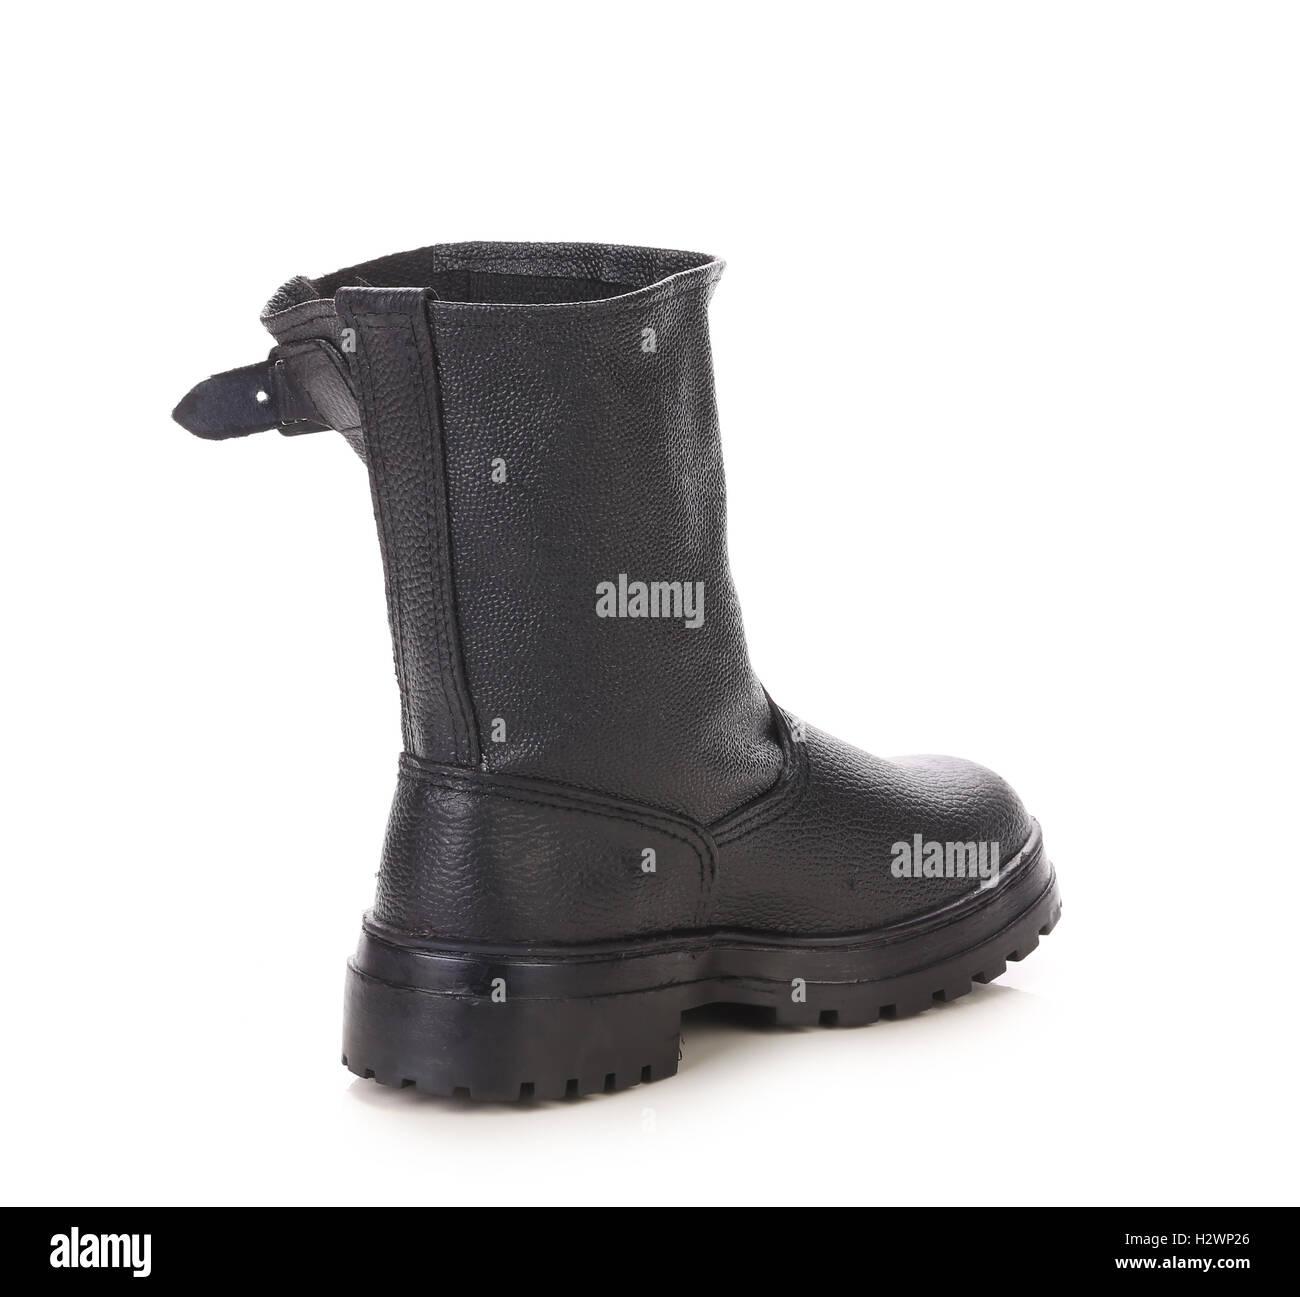 Kersey boot. Stock Photo